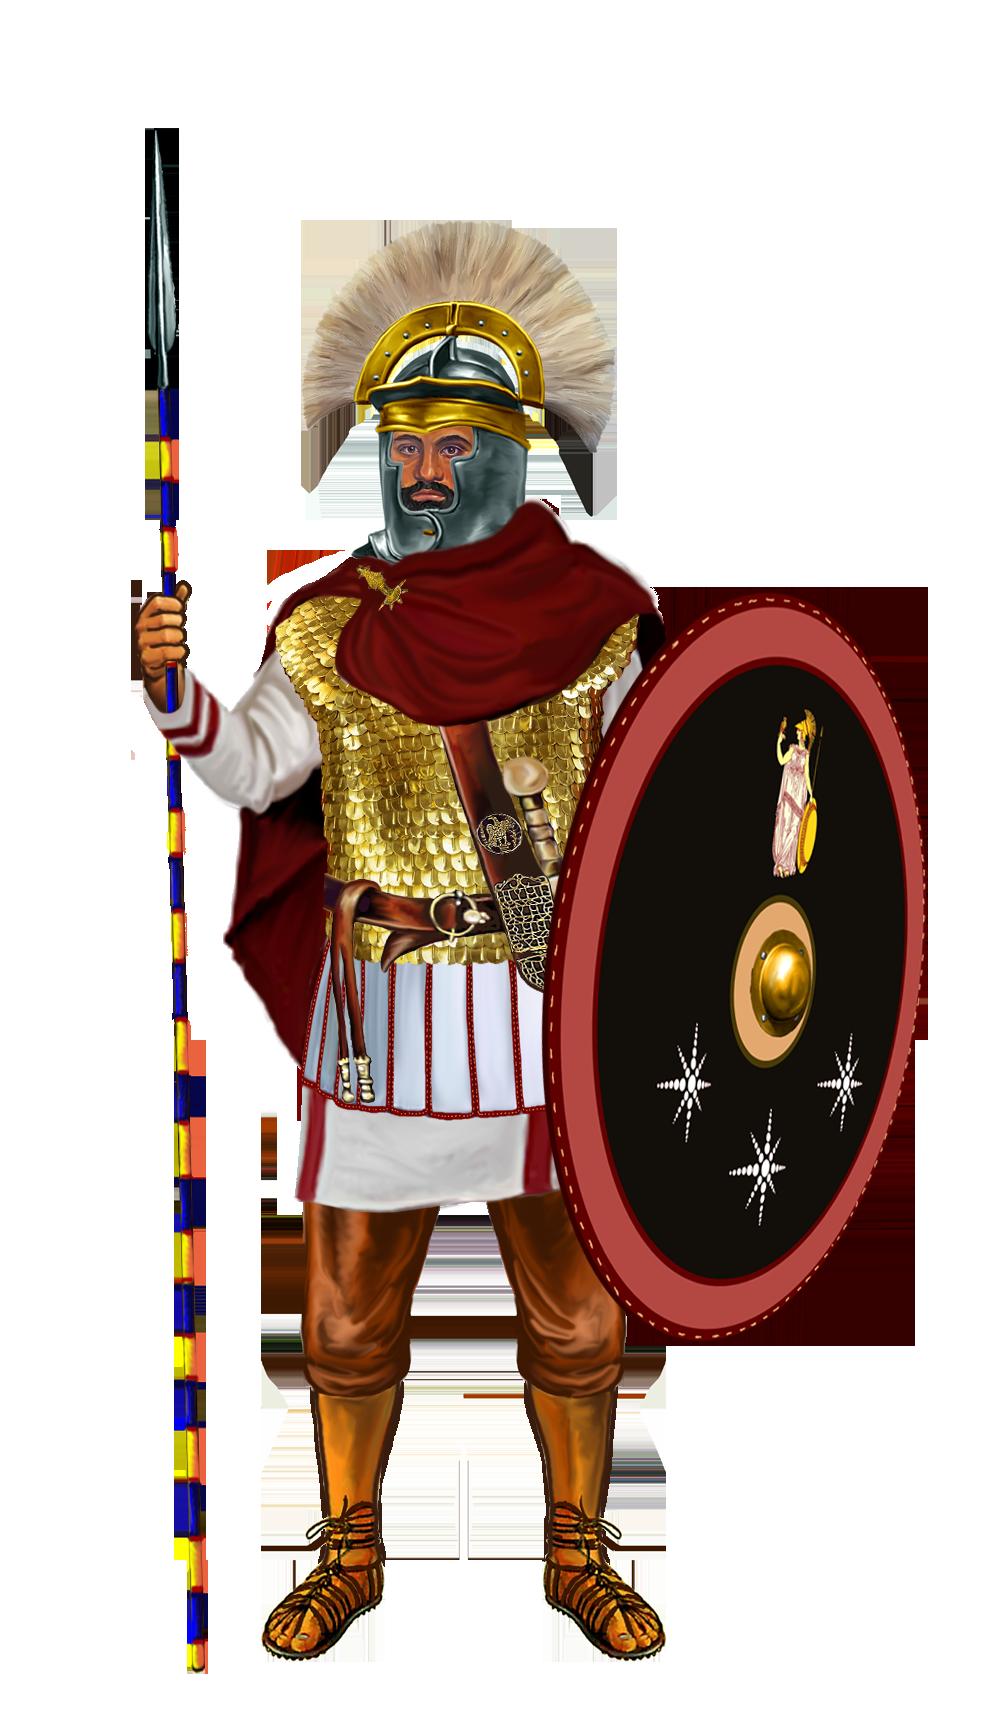 Rimskaya Armiya Principat Centurion I Minervia Legio Iii V N E Max58 Roman Soldiers Roman Empire Ancient Warriors